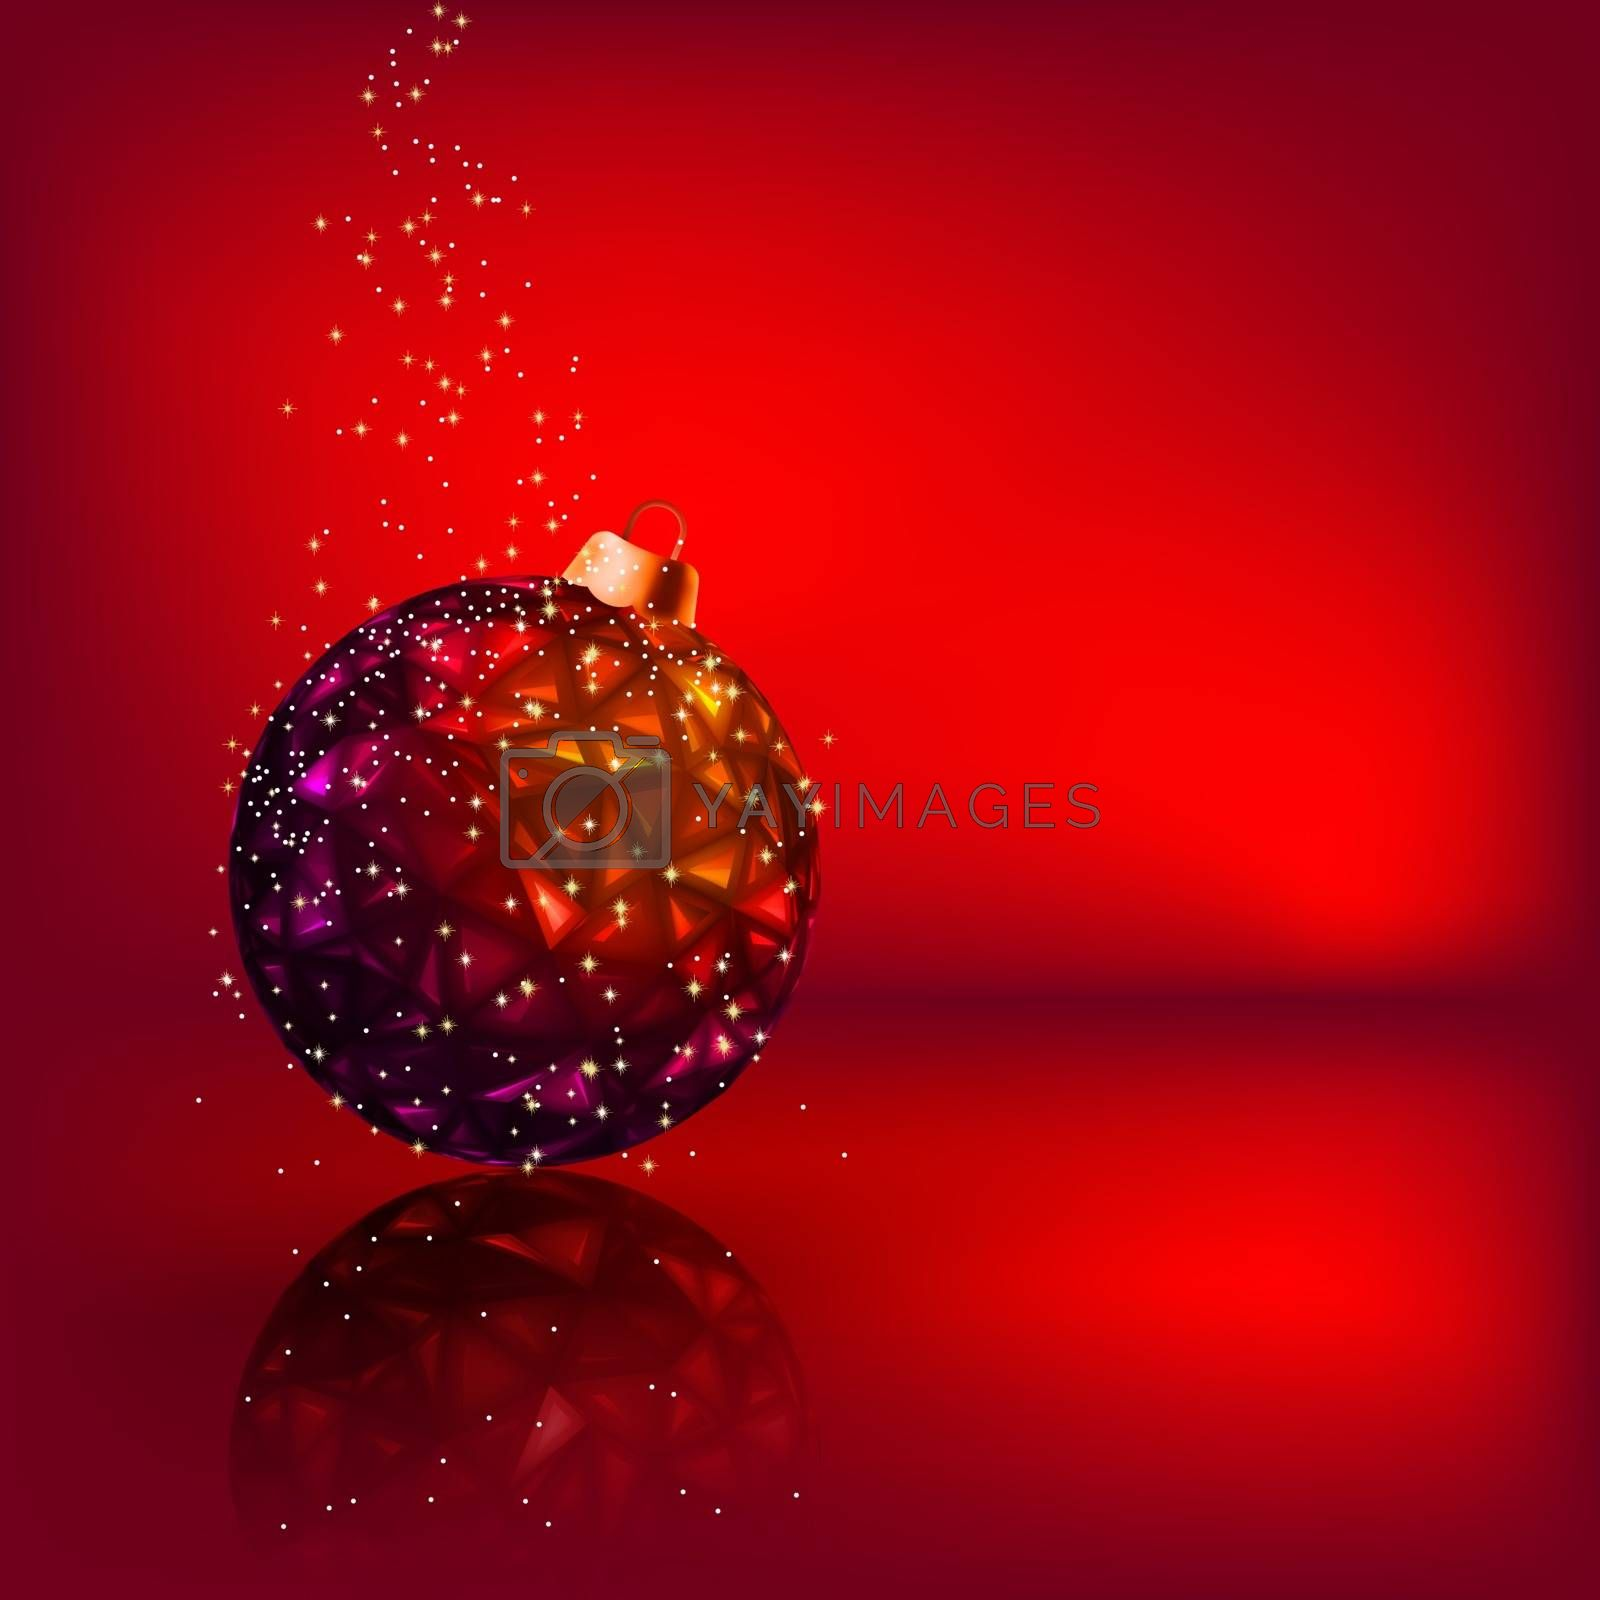 Christmas card with stars and Christmas ball. EPS 8 vector file included